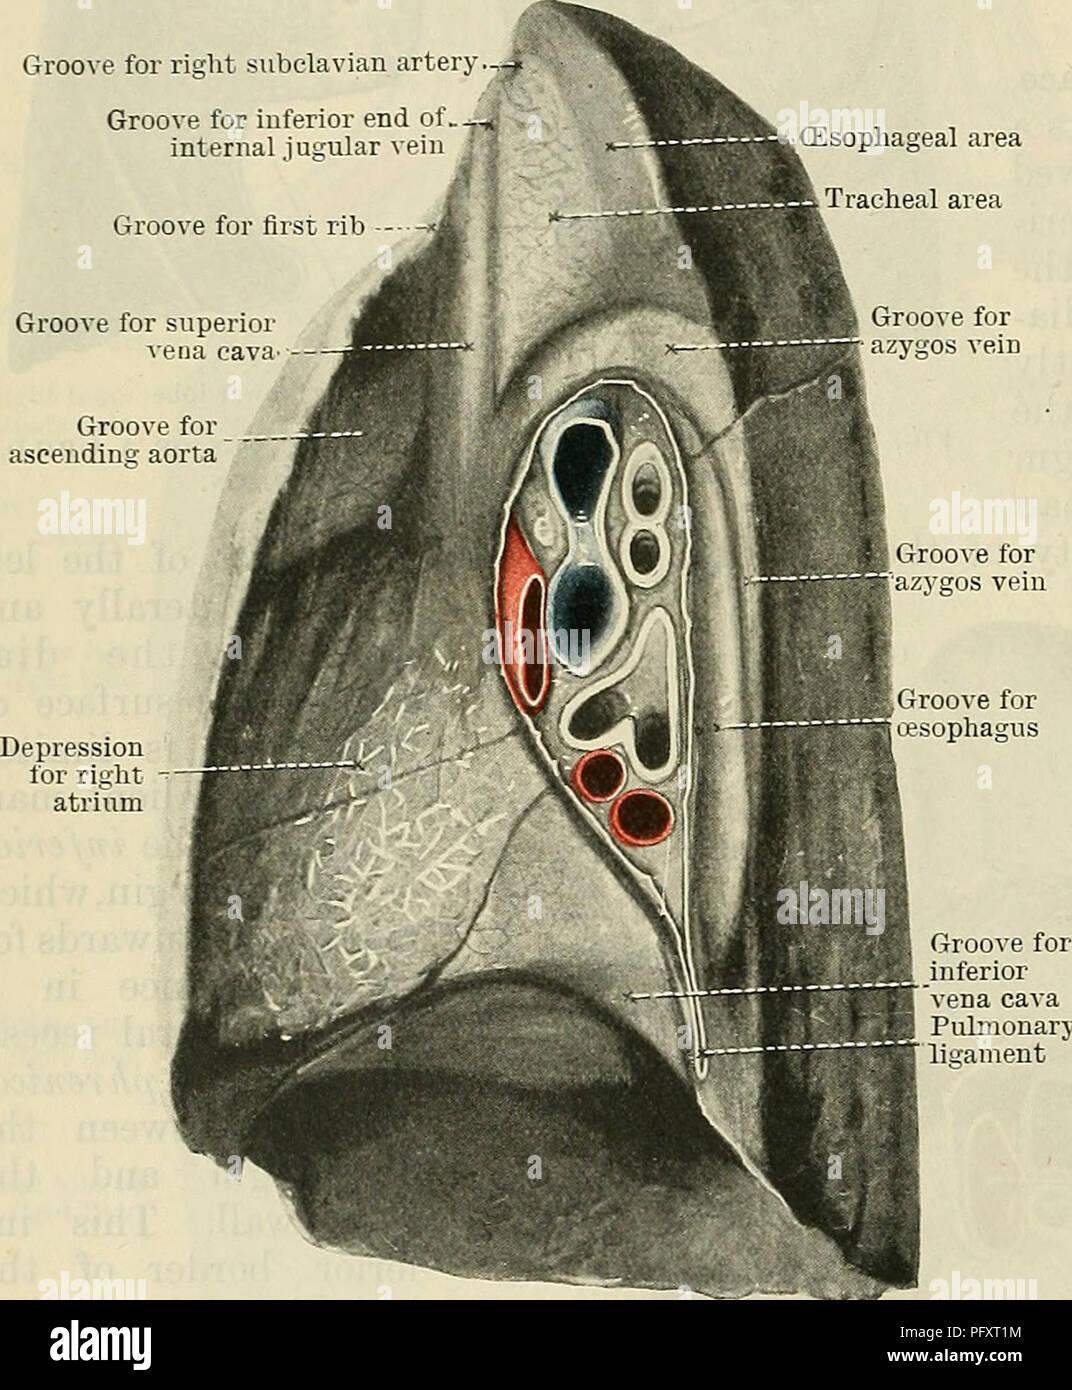 Lower Abdominal Aorta Imágenes De Stock & Lower Abdominal Aorta ...